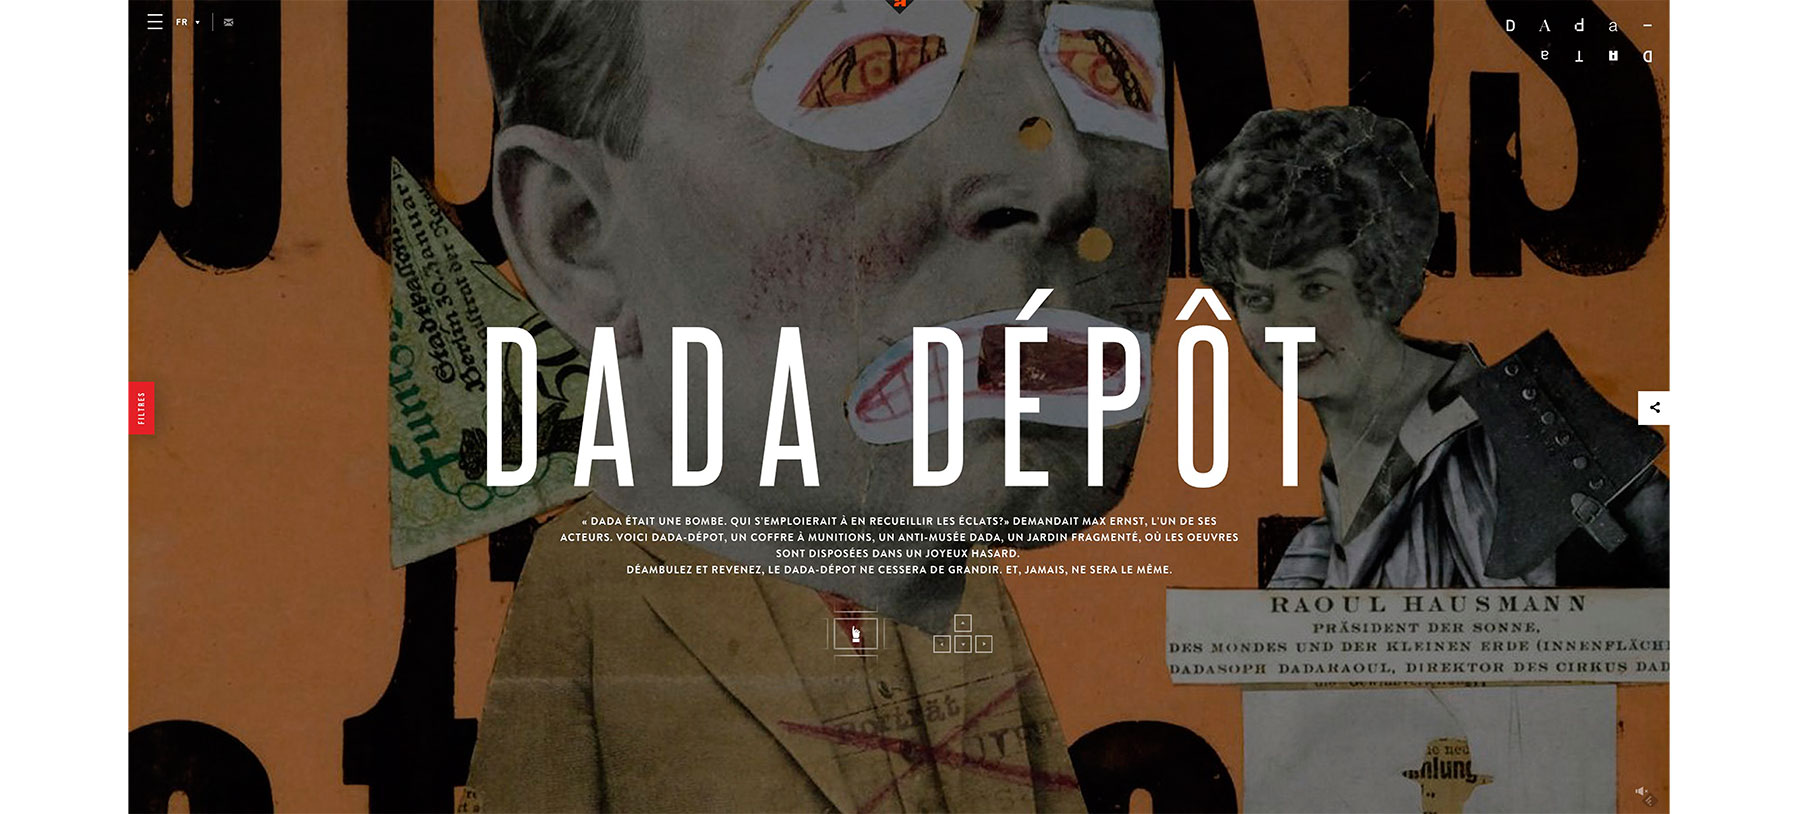 dada-data-site-interactif-arte-capture-depot